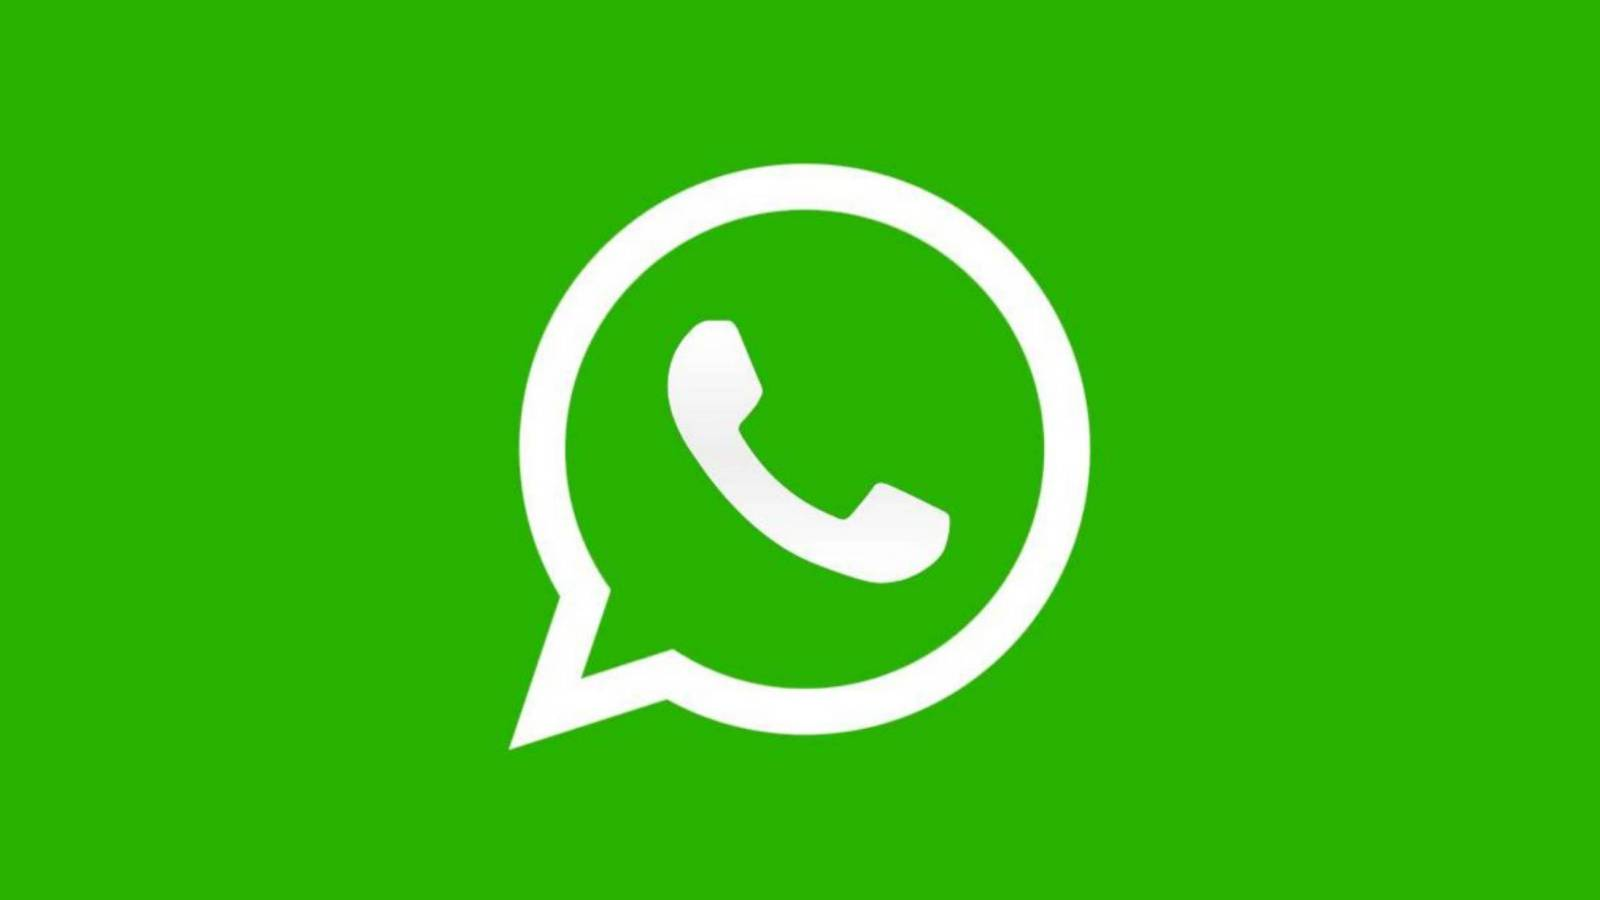 whatsapp cautatori sticker